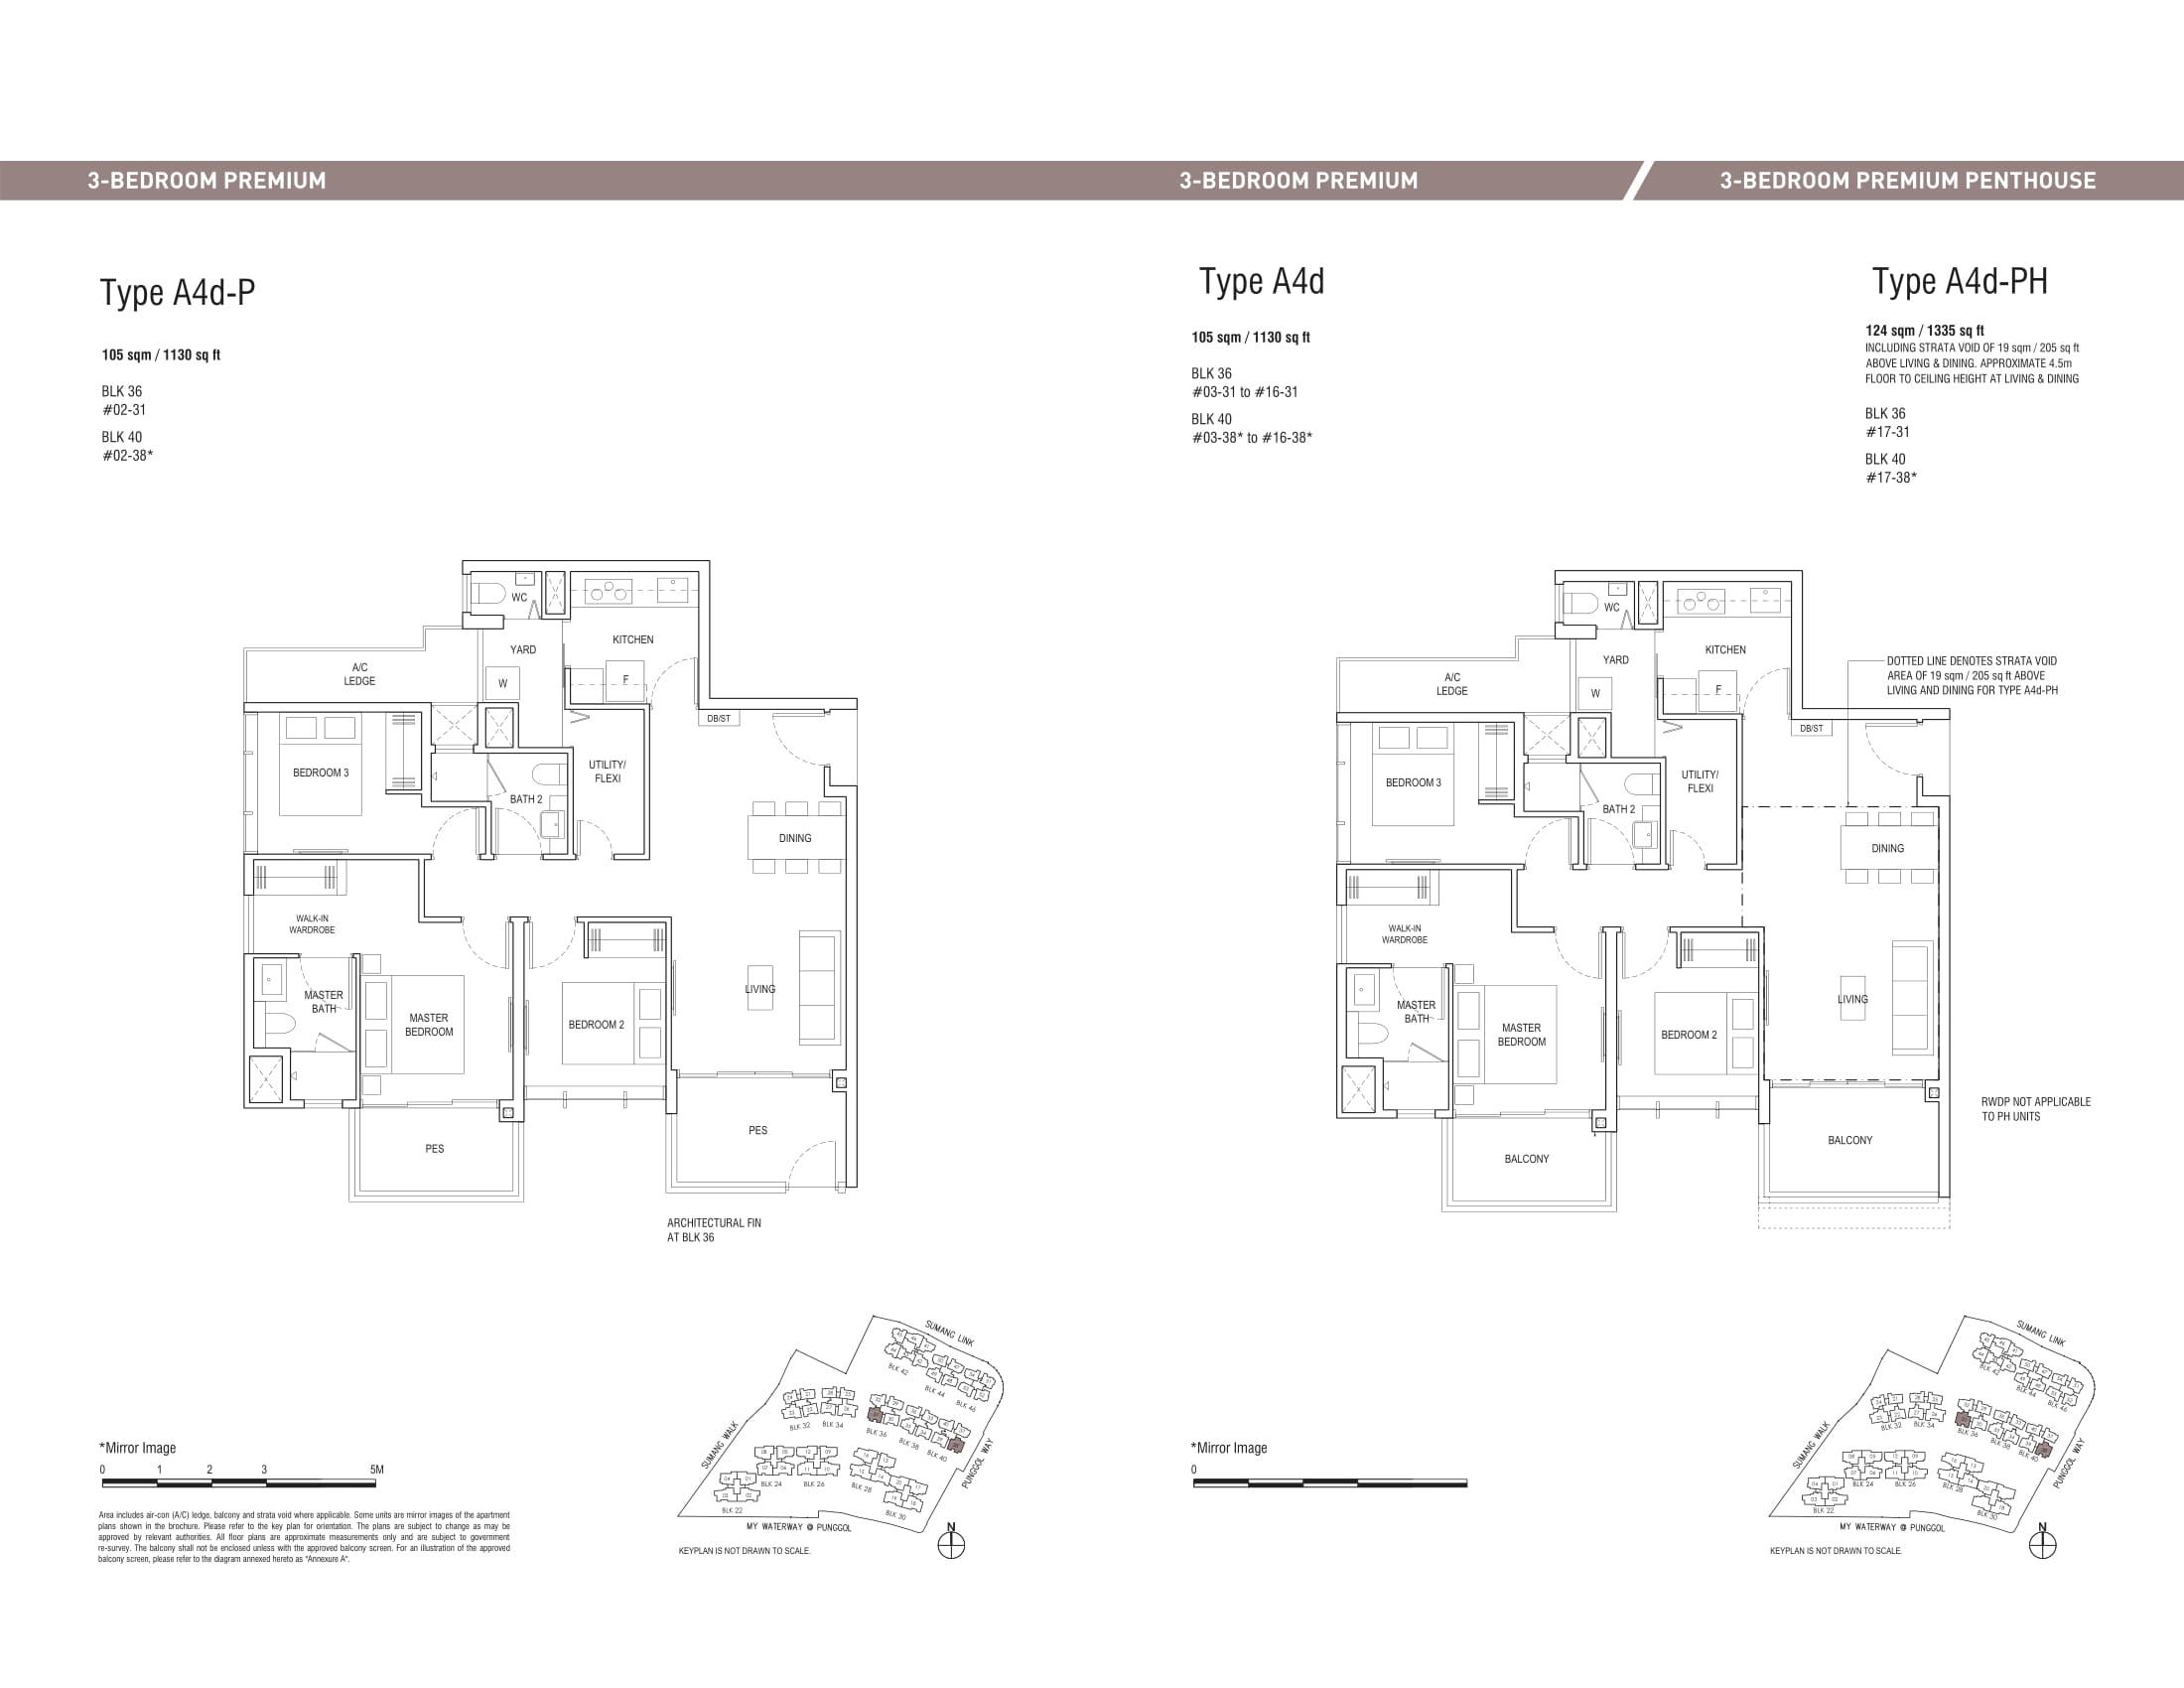 Piermont Grand EC's three-bedroom premium and three-bedroom premium penthouse types